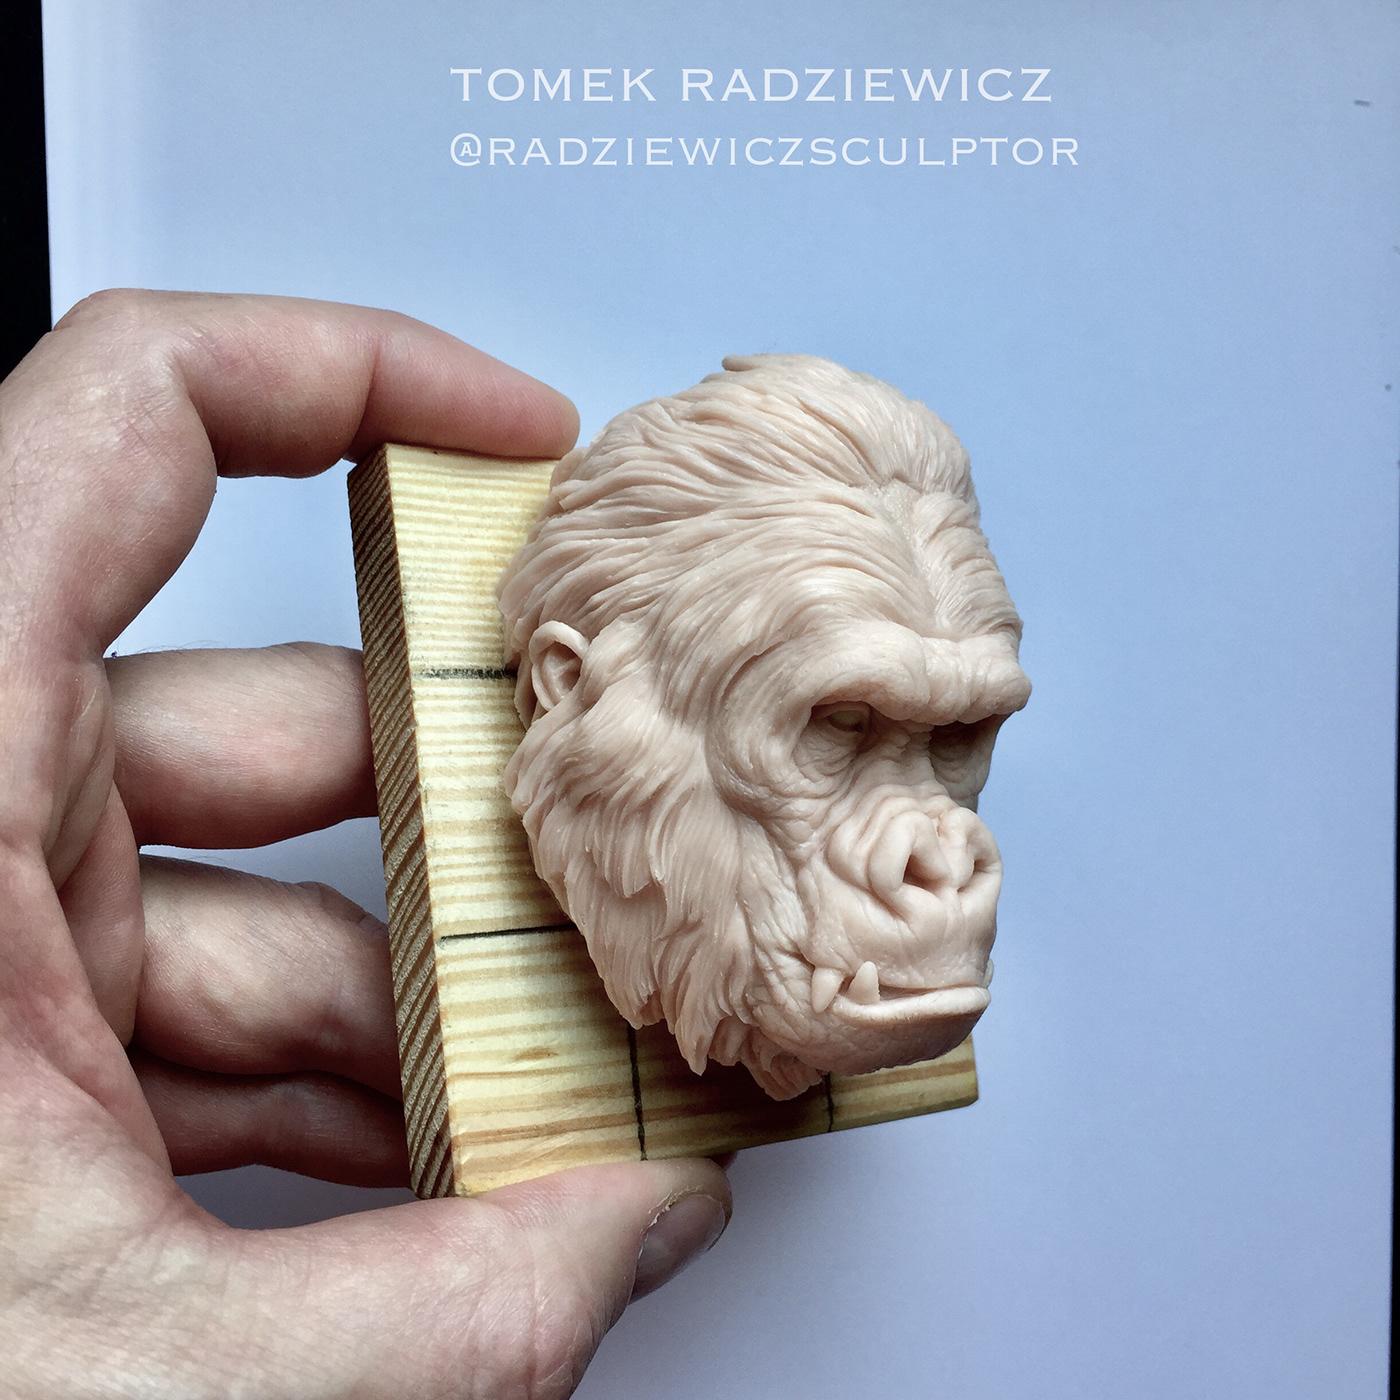 Character gorilla sculpture